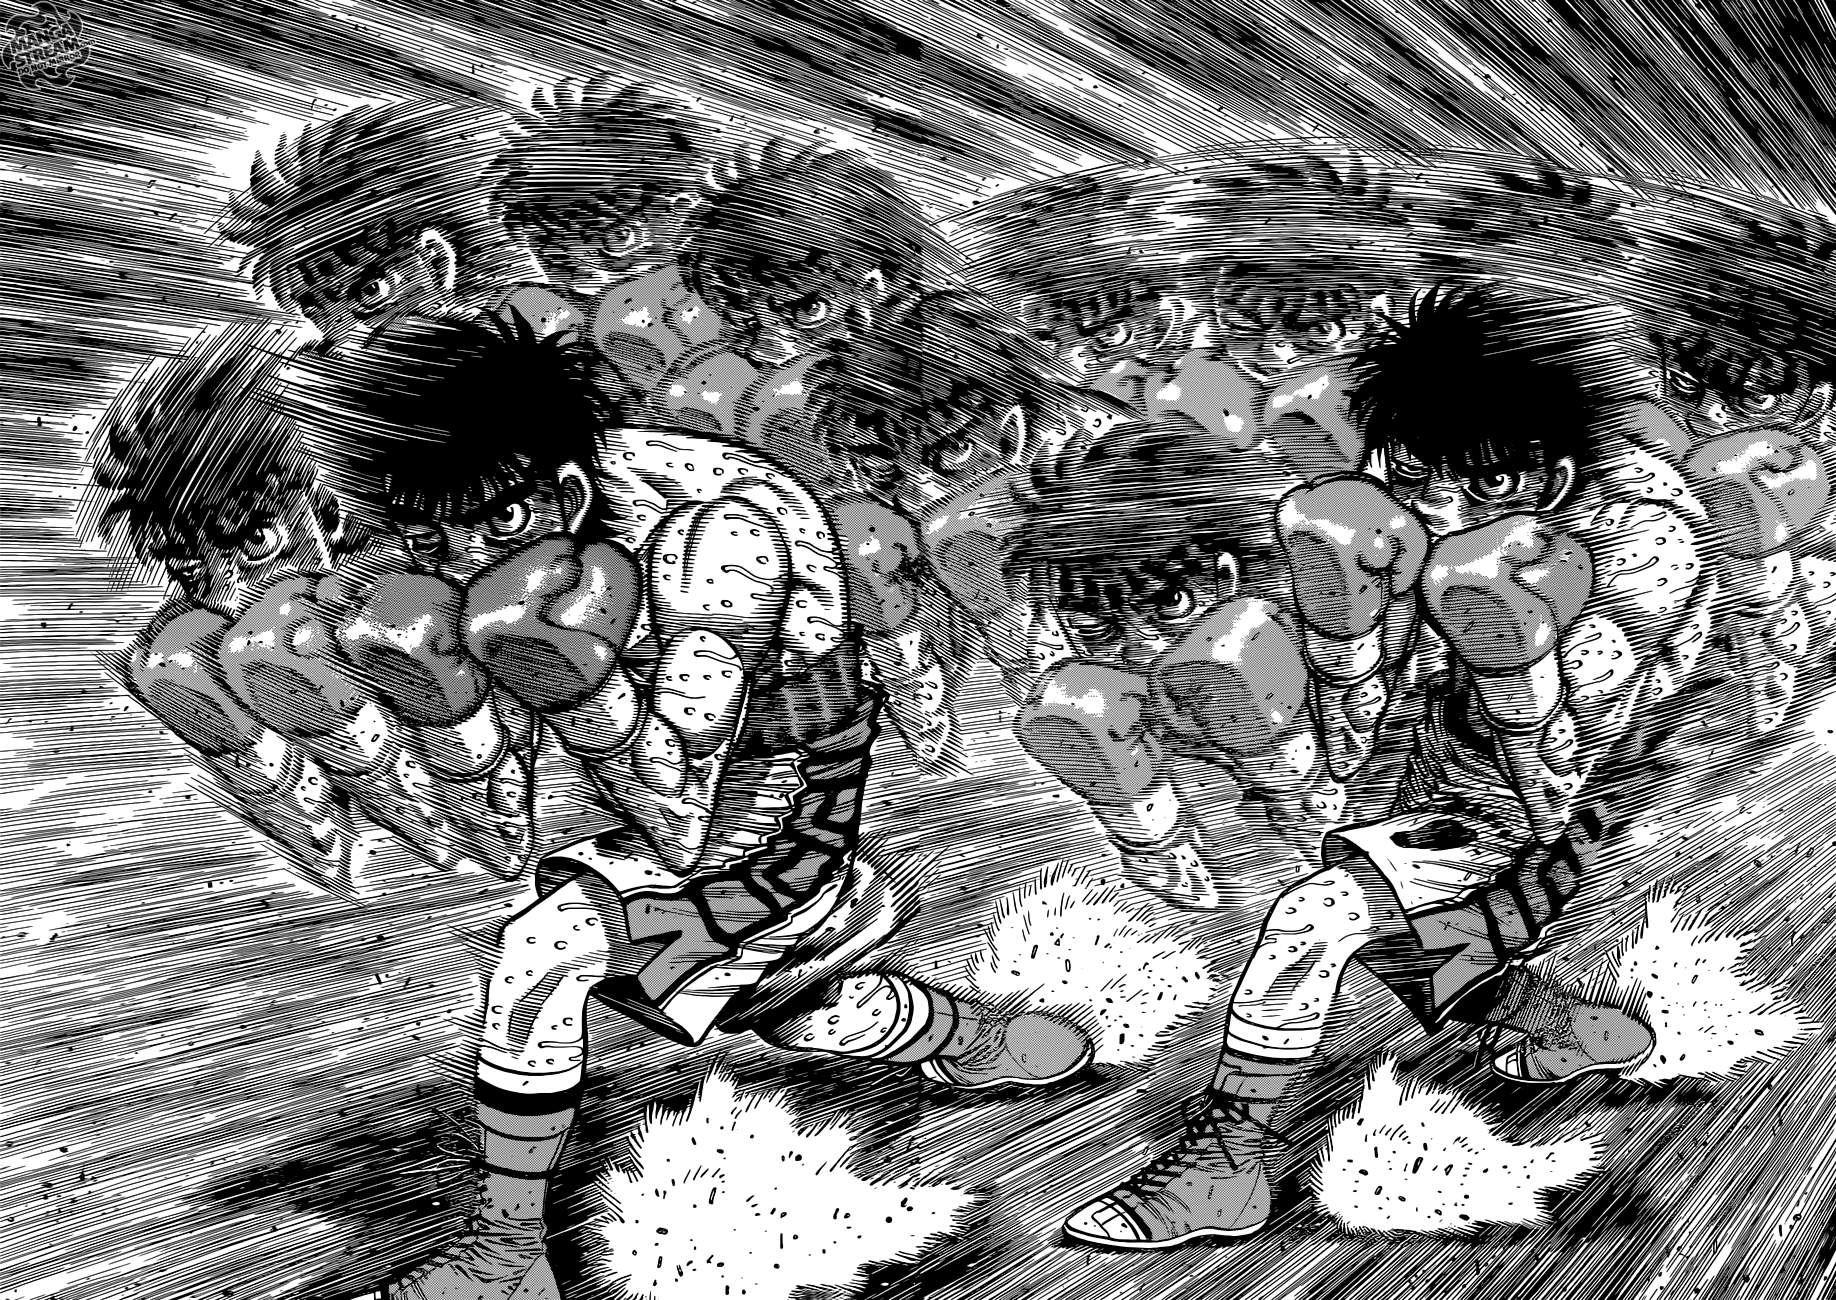 Hajime No Ippo Chapter 1055 9 Manga Art Manga Drawing Tutorials Manga Artist